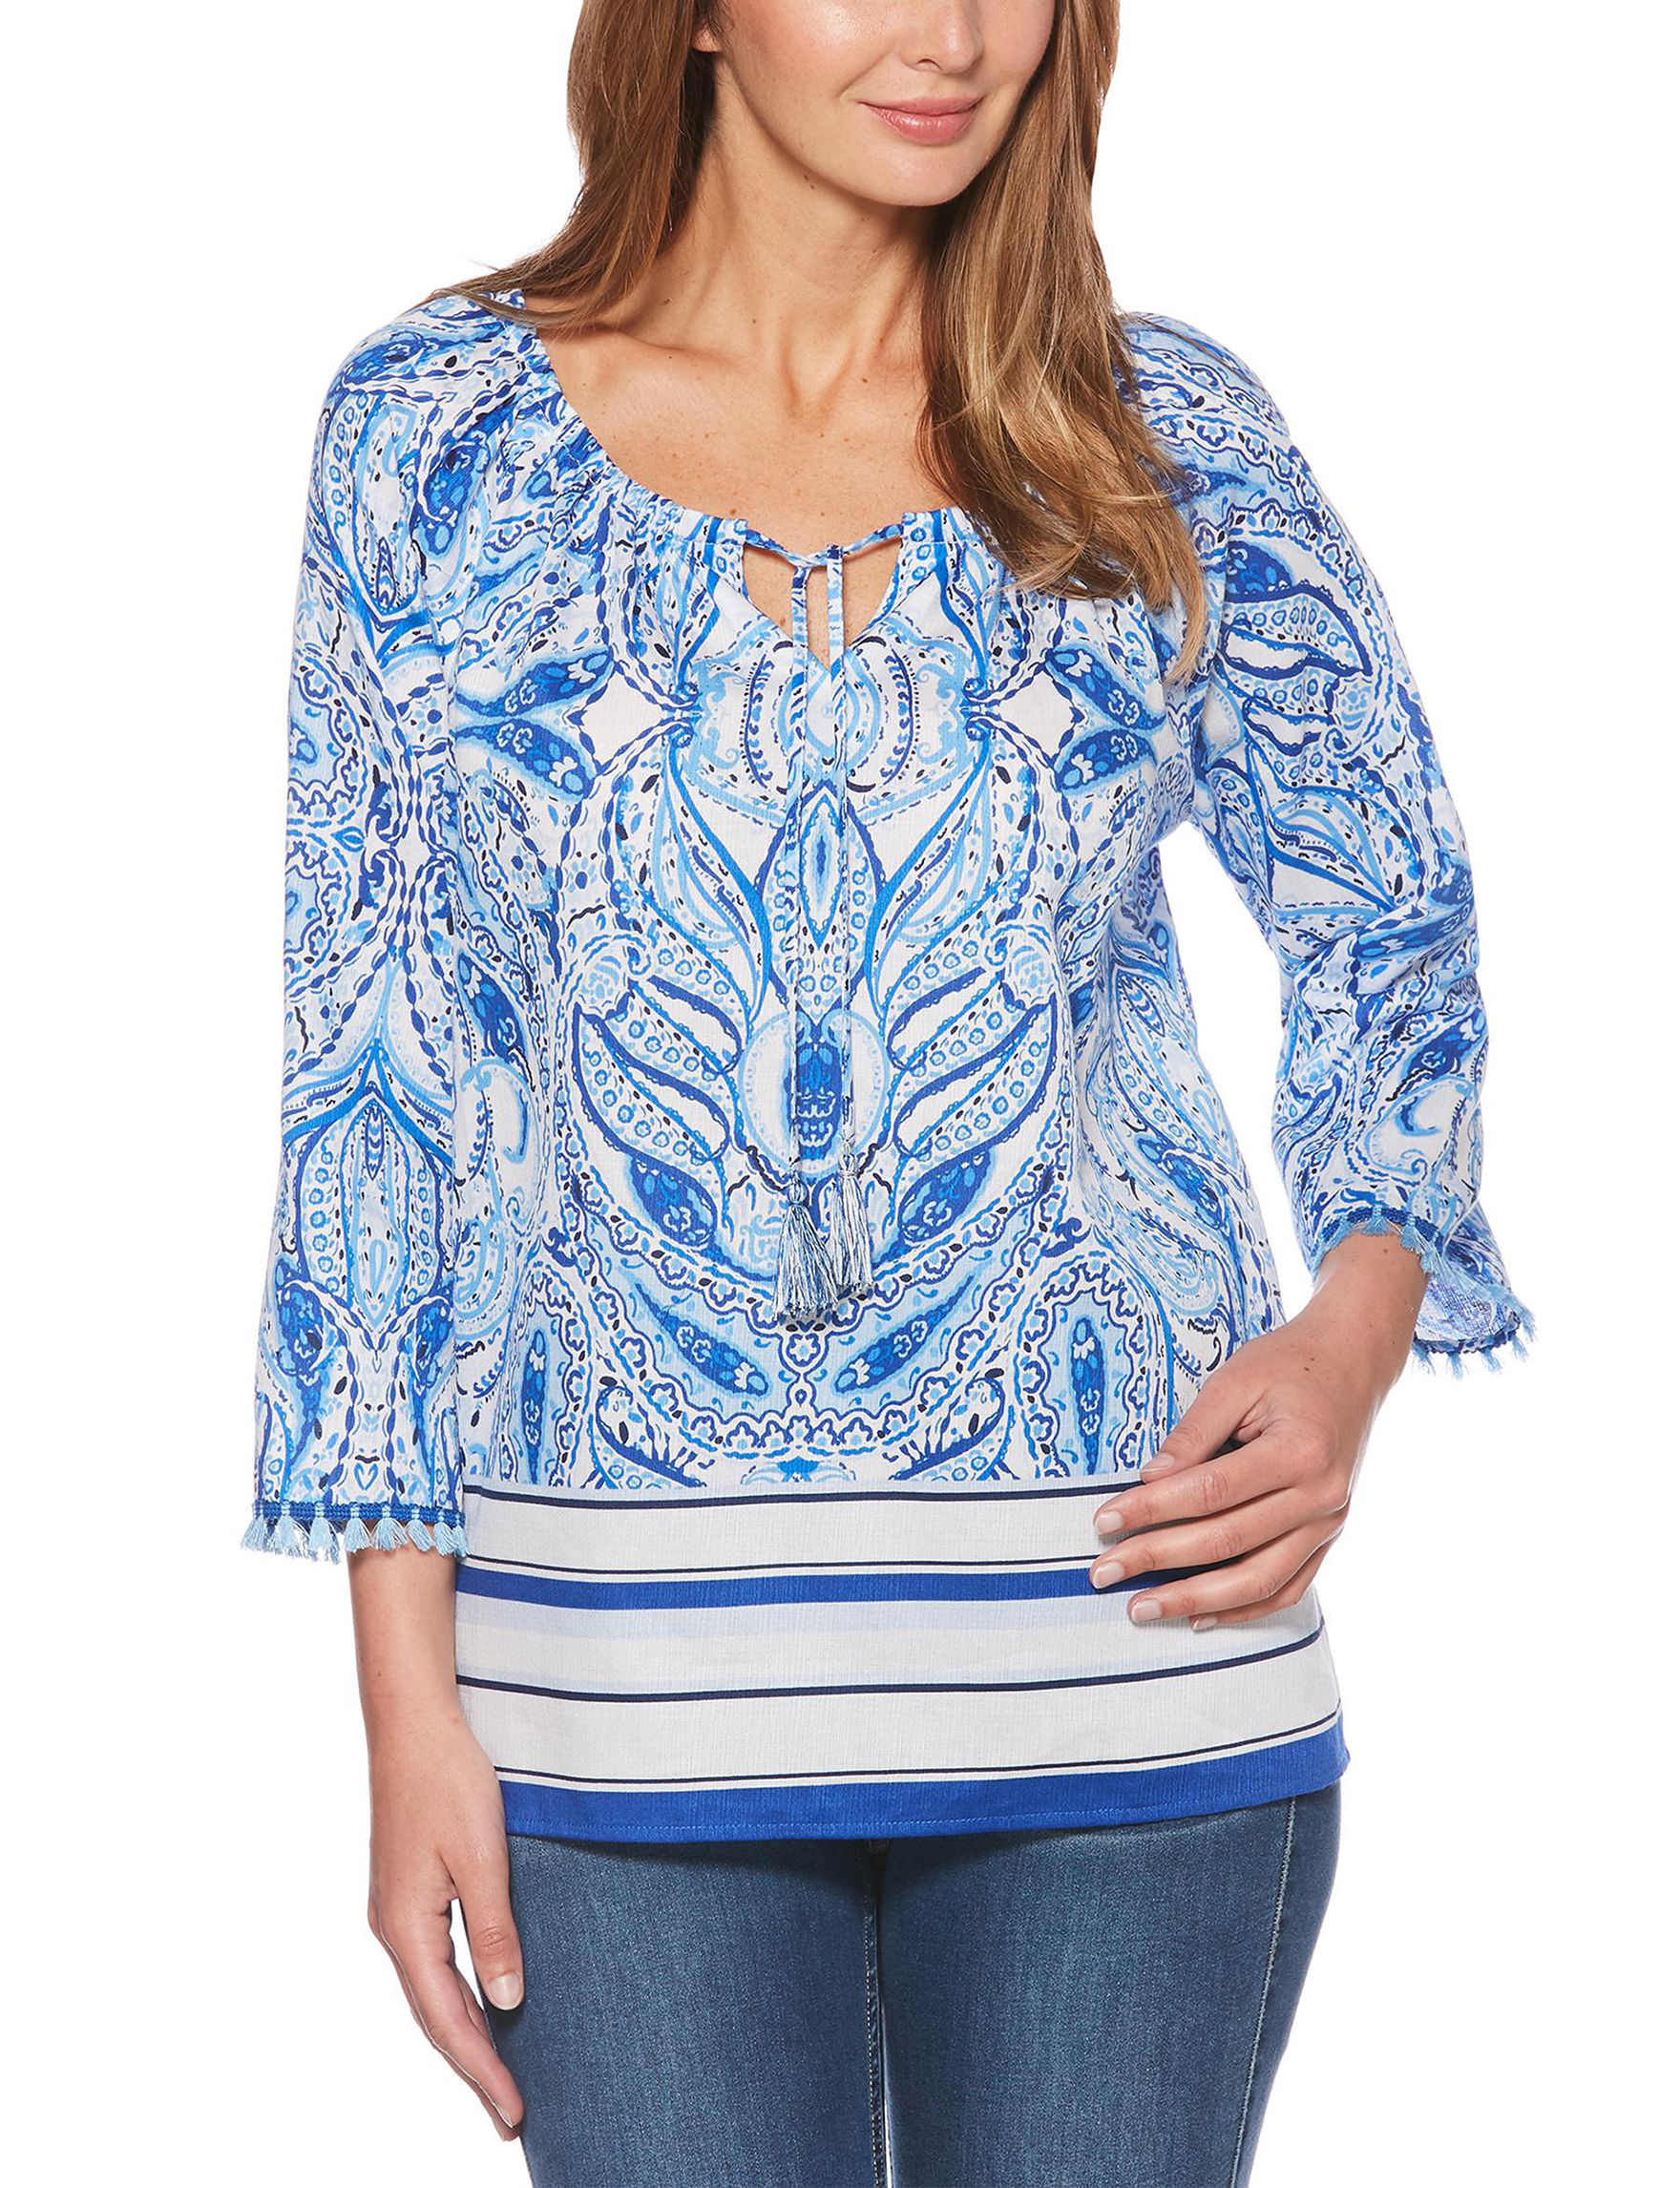 Rafaella White Multi Shirts & Blouses